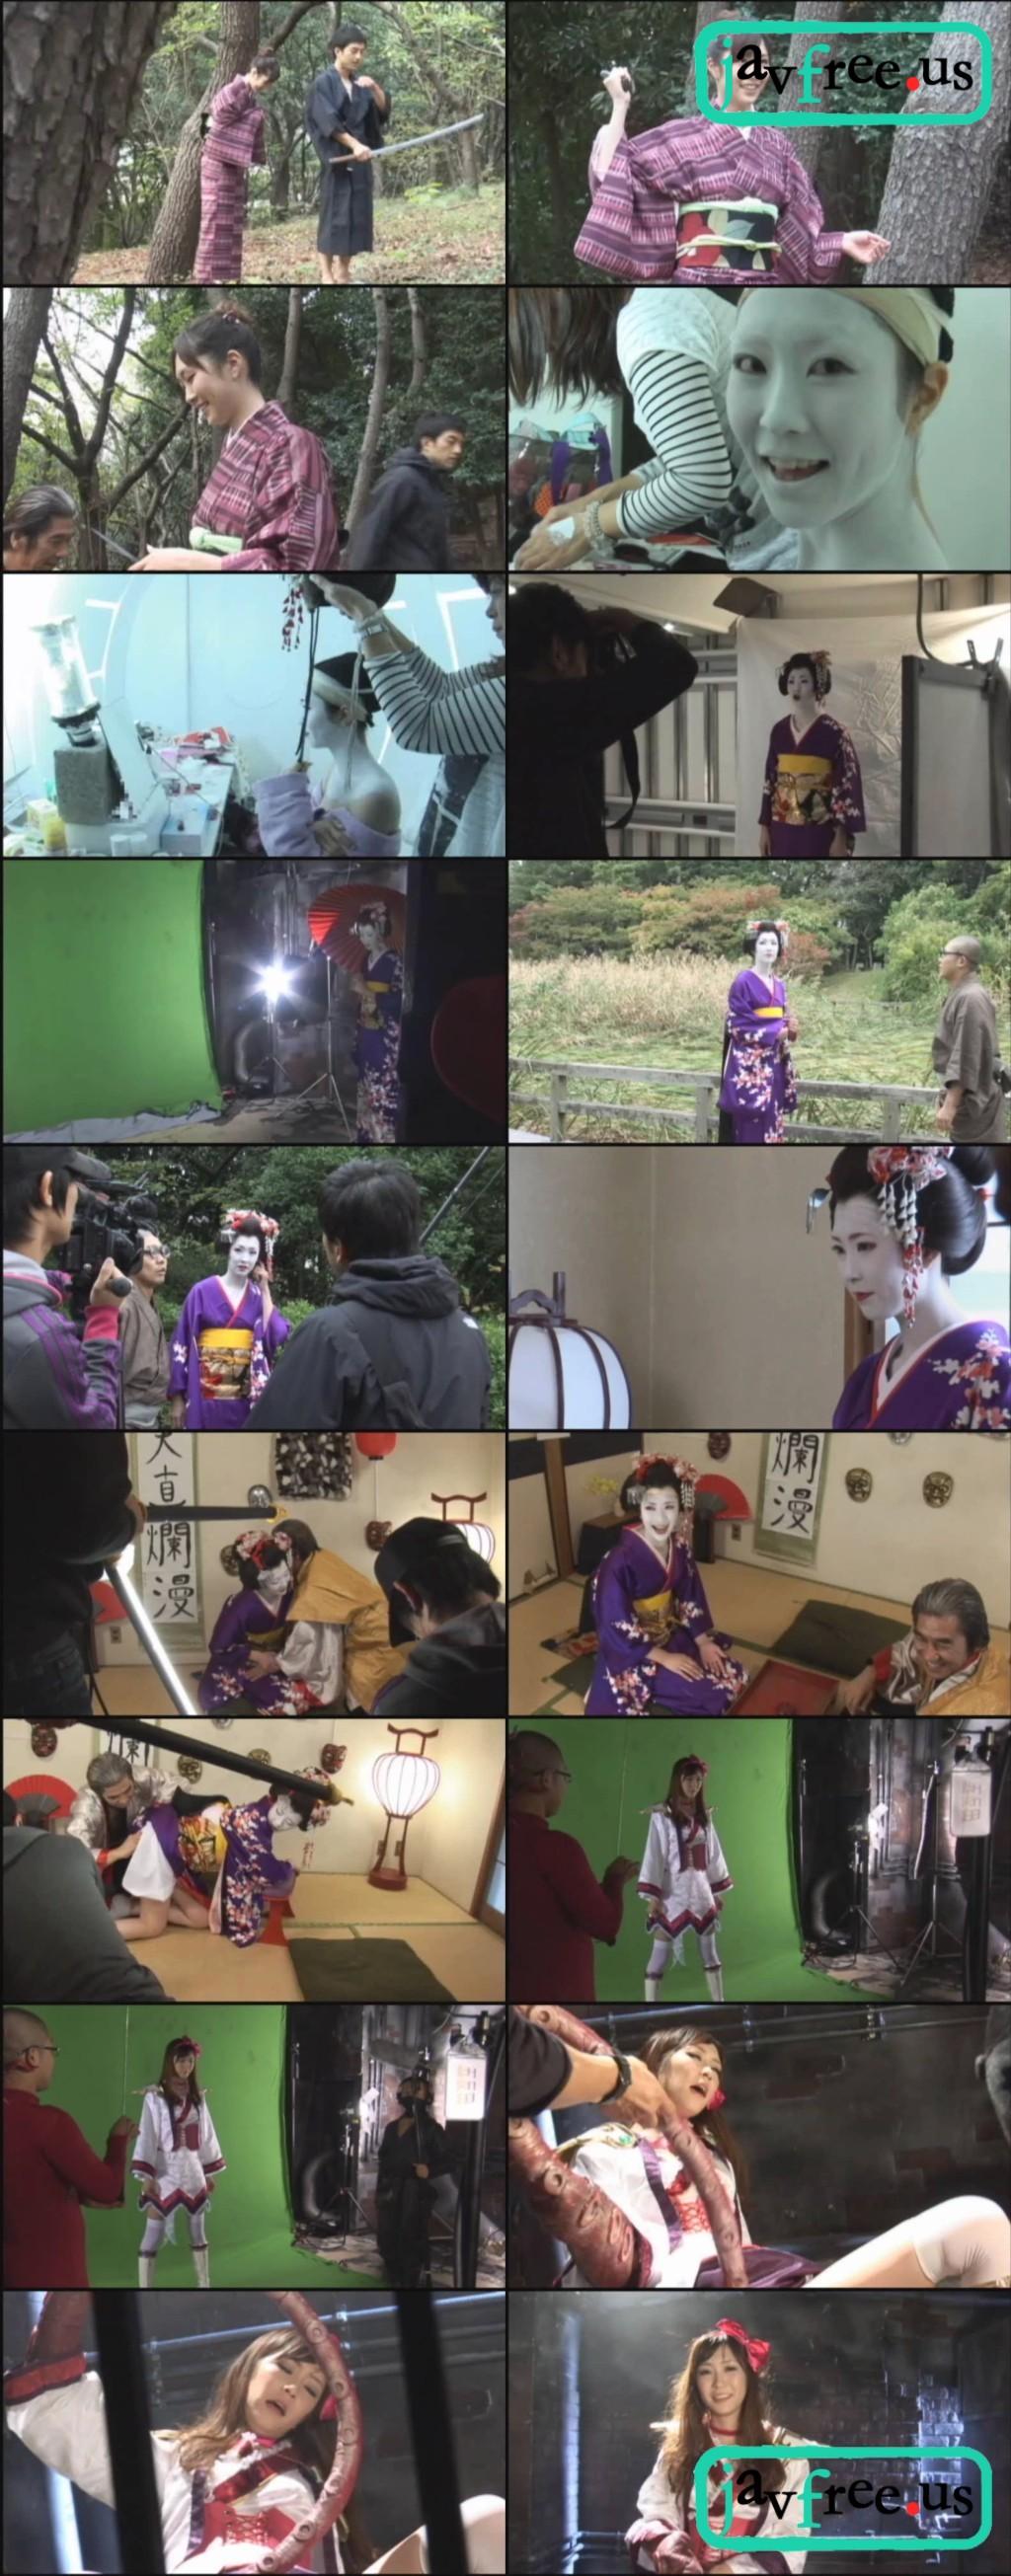 [GEXP-34] 舞妓ヒロイン 鏡花 - image GEXP-34c on https://javfree.me